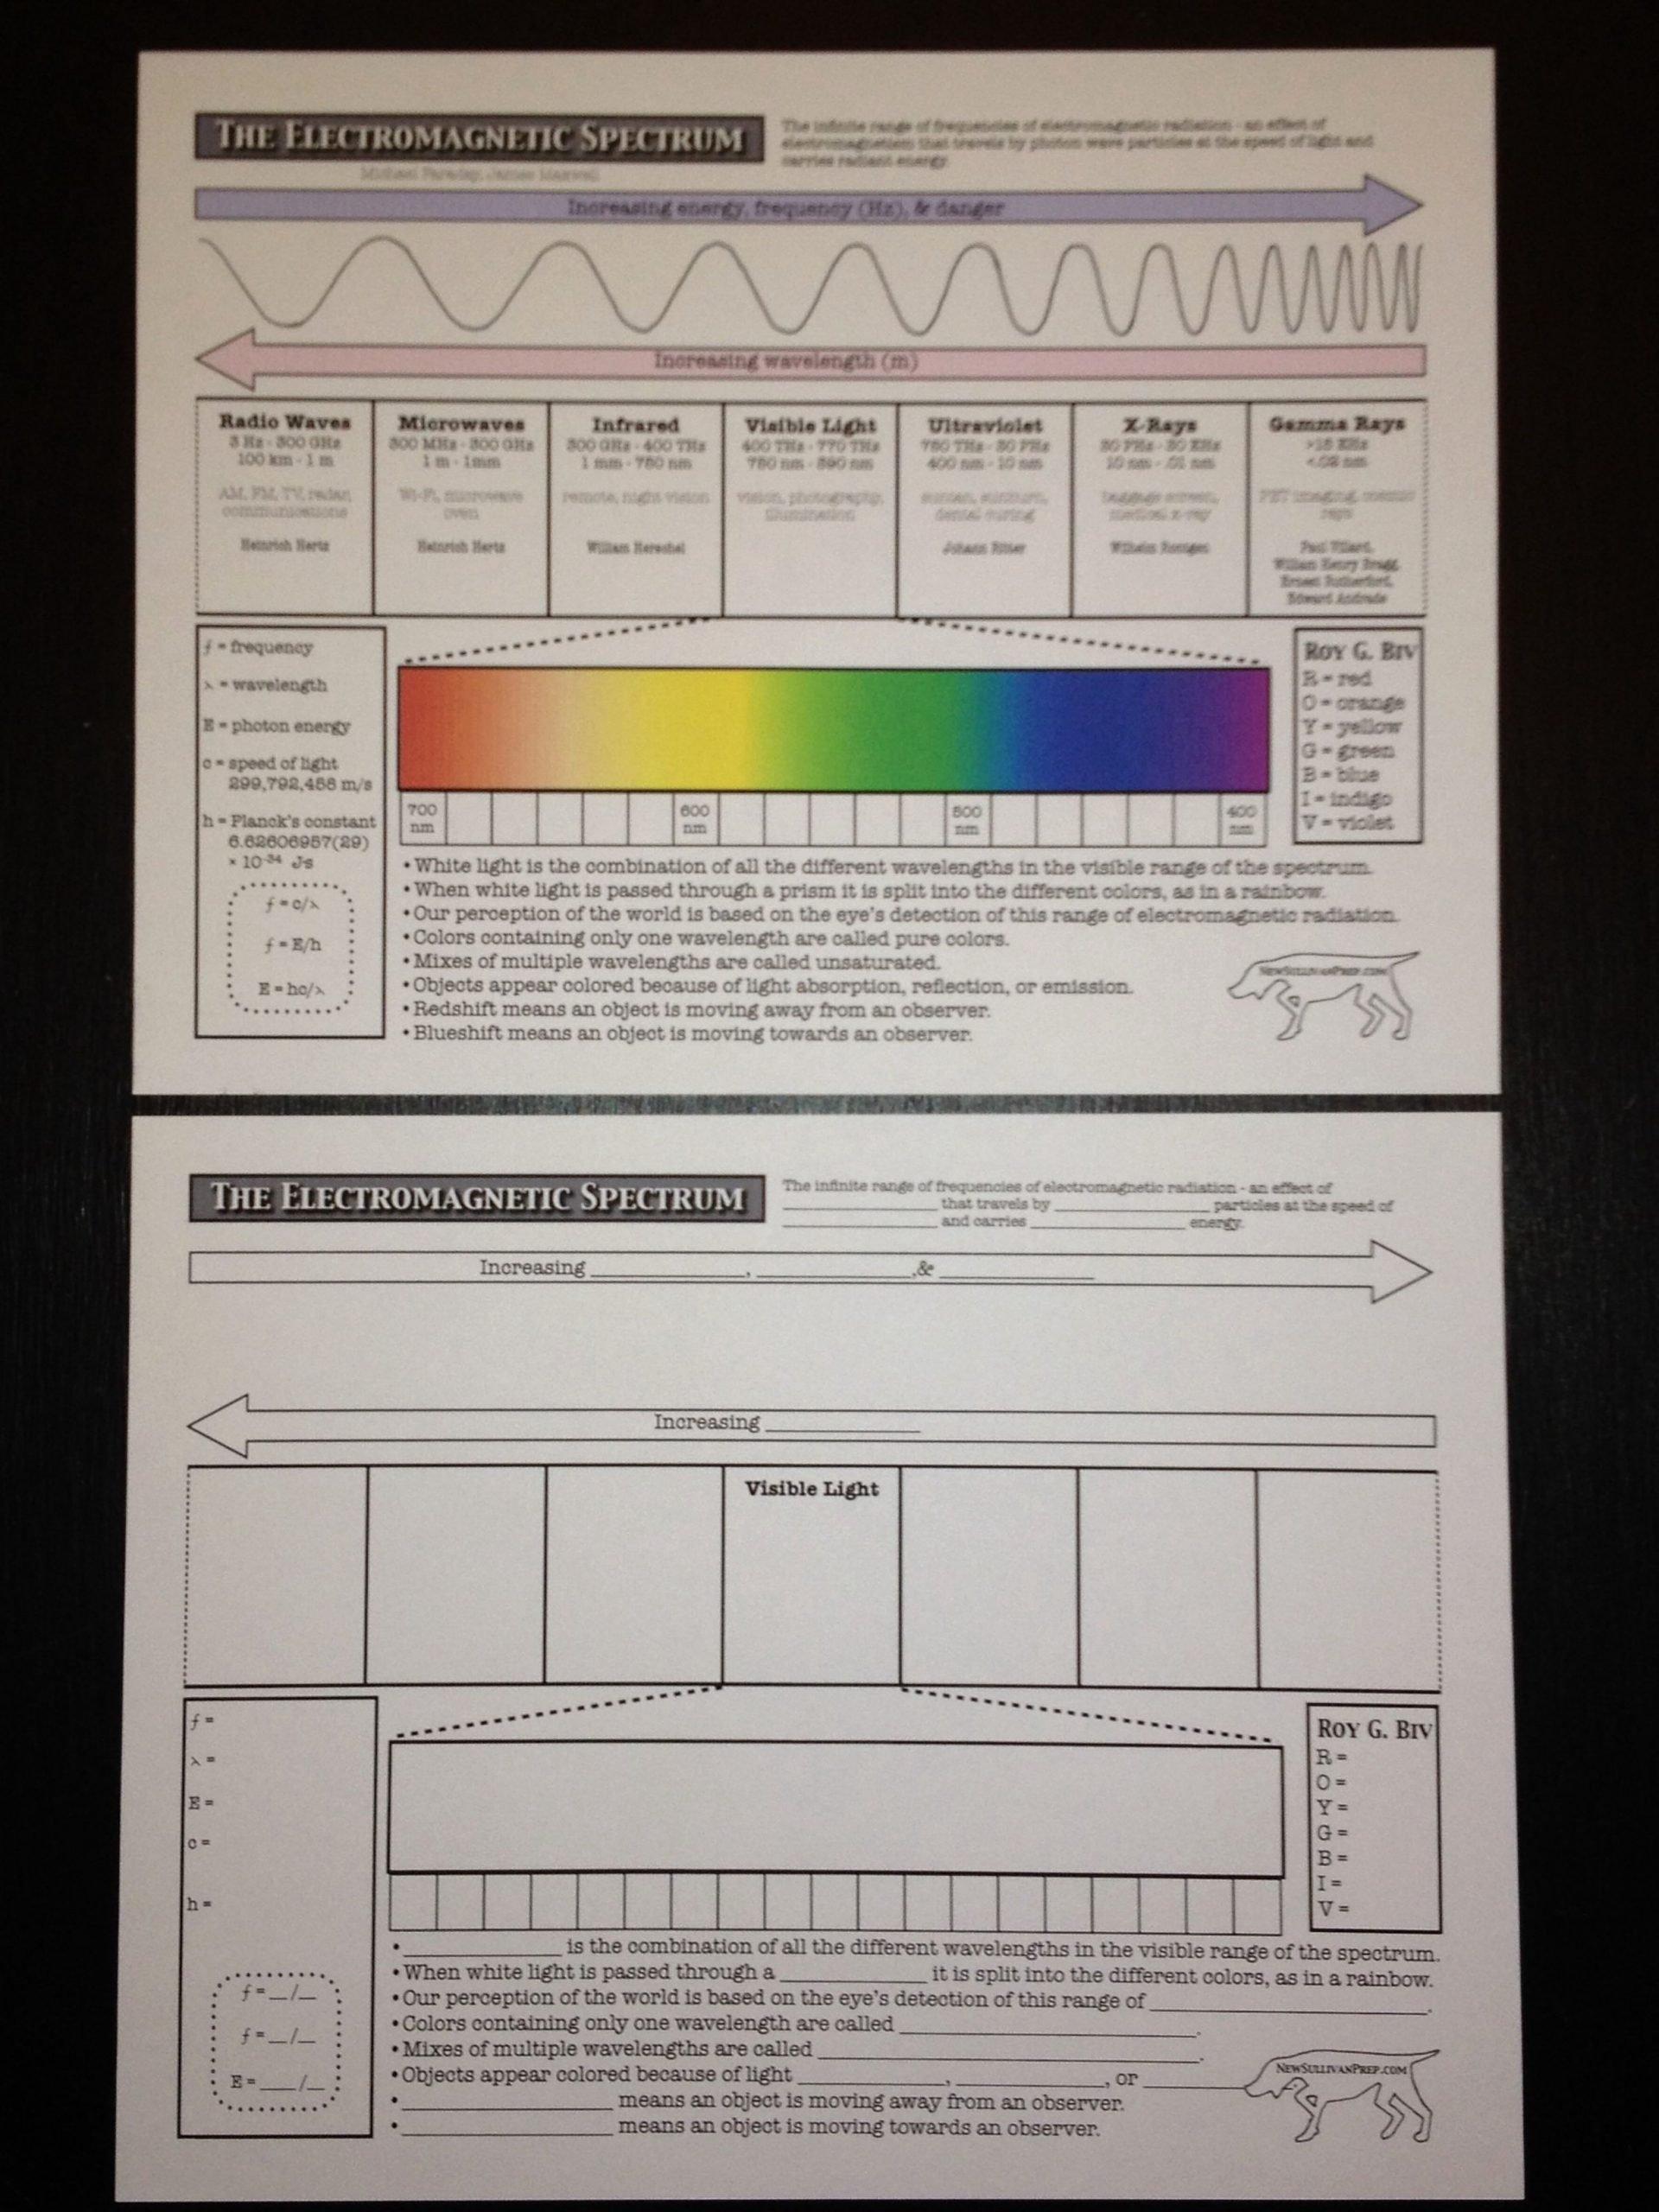 Electromagnetic Spectrum Worksheet High School New Free Electromagnetic Spectrum Worksheets Available at